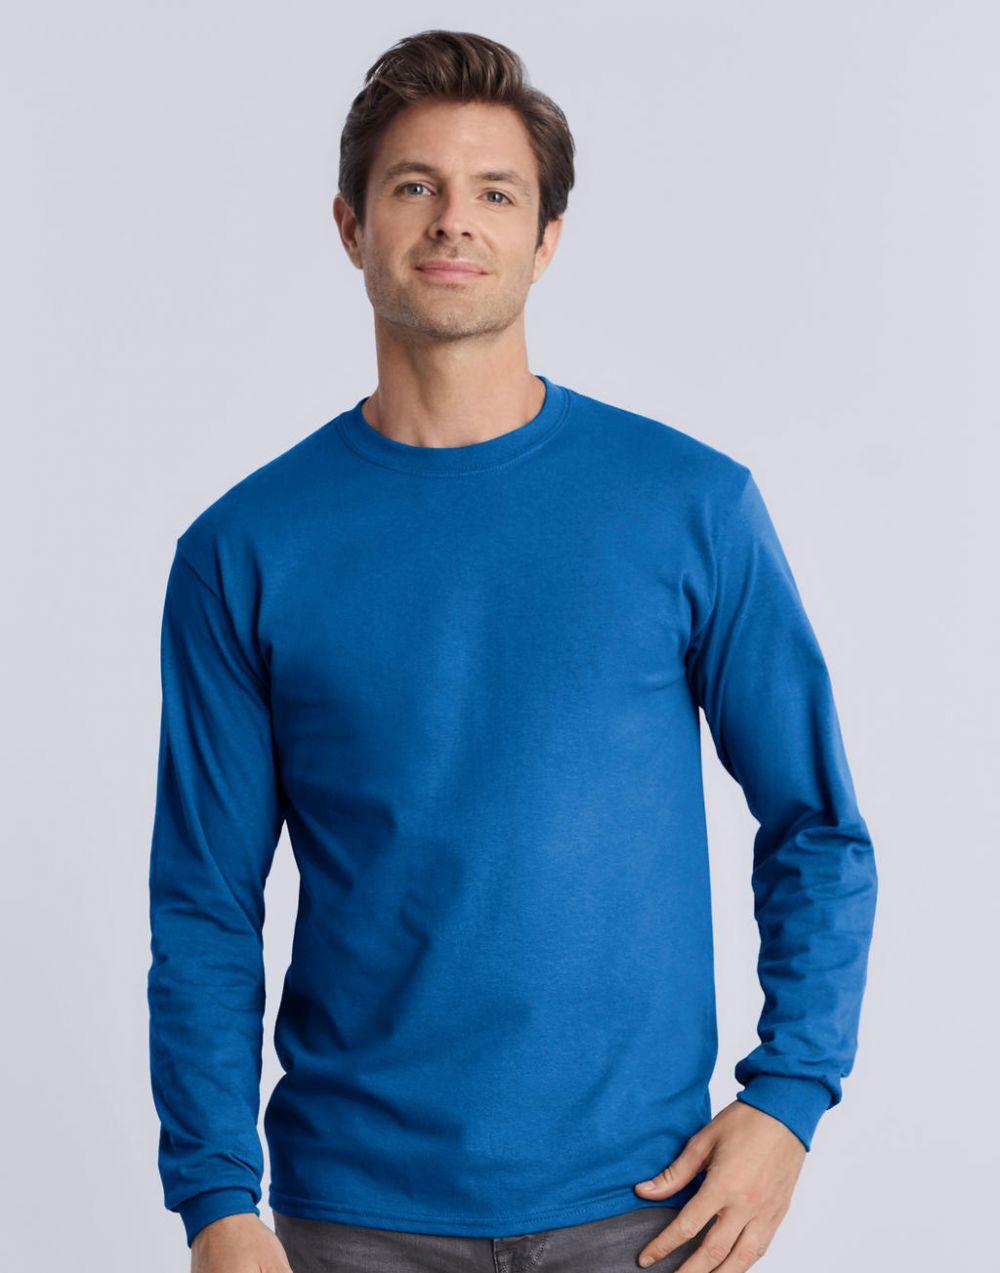 Camisetas manga larga gildan ultra manga larga hombre para personalizar vista 1